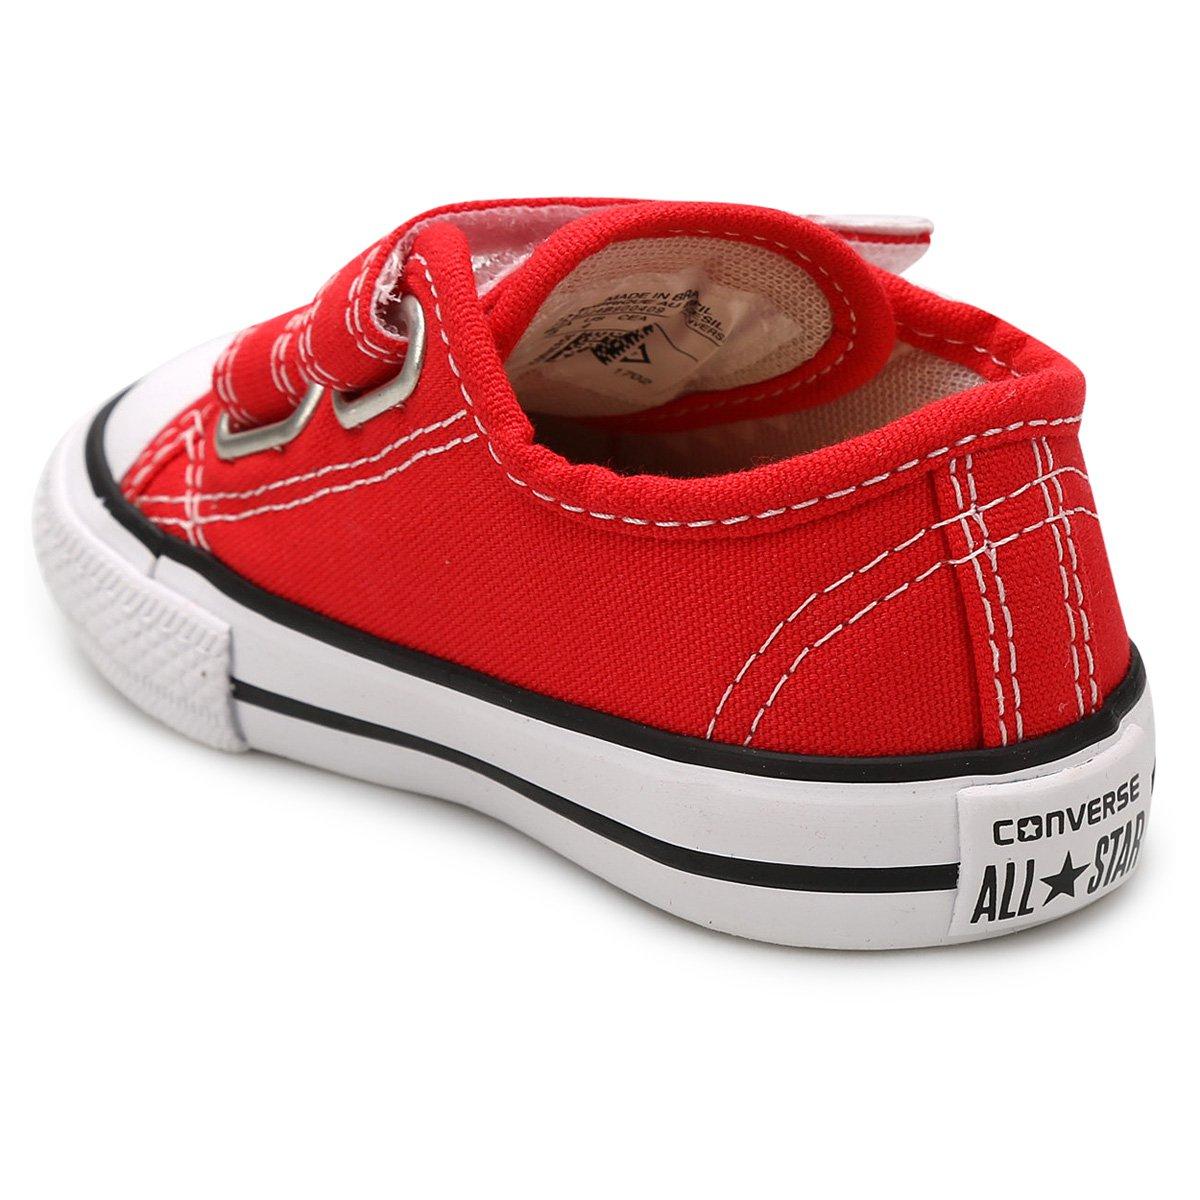 0ac679a22cce ... Tênis Infantil Converse All Star CT Border 2 Velcros Baby - Tam  25 -  ...